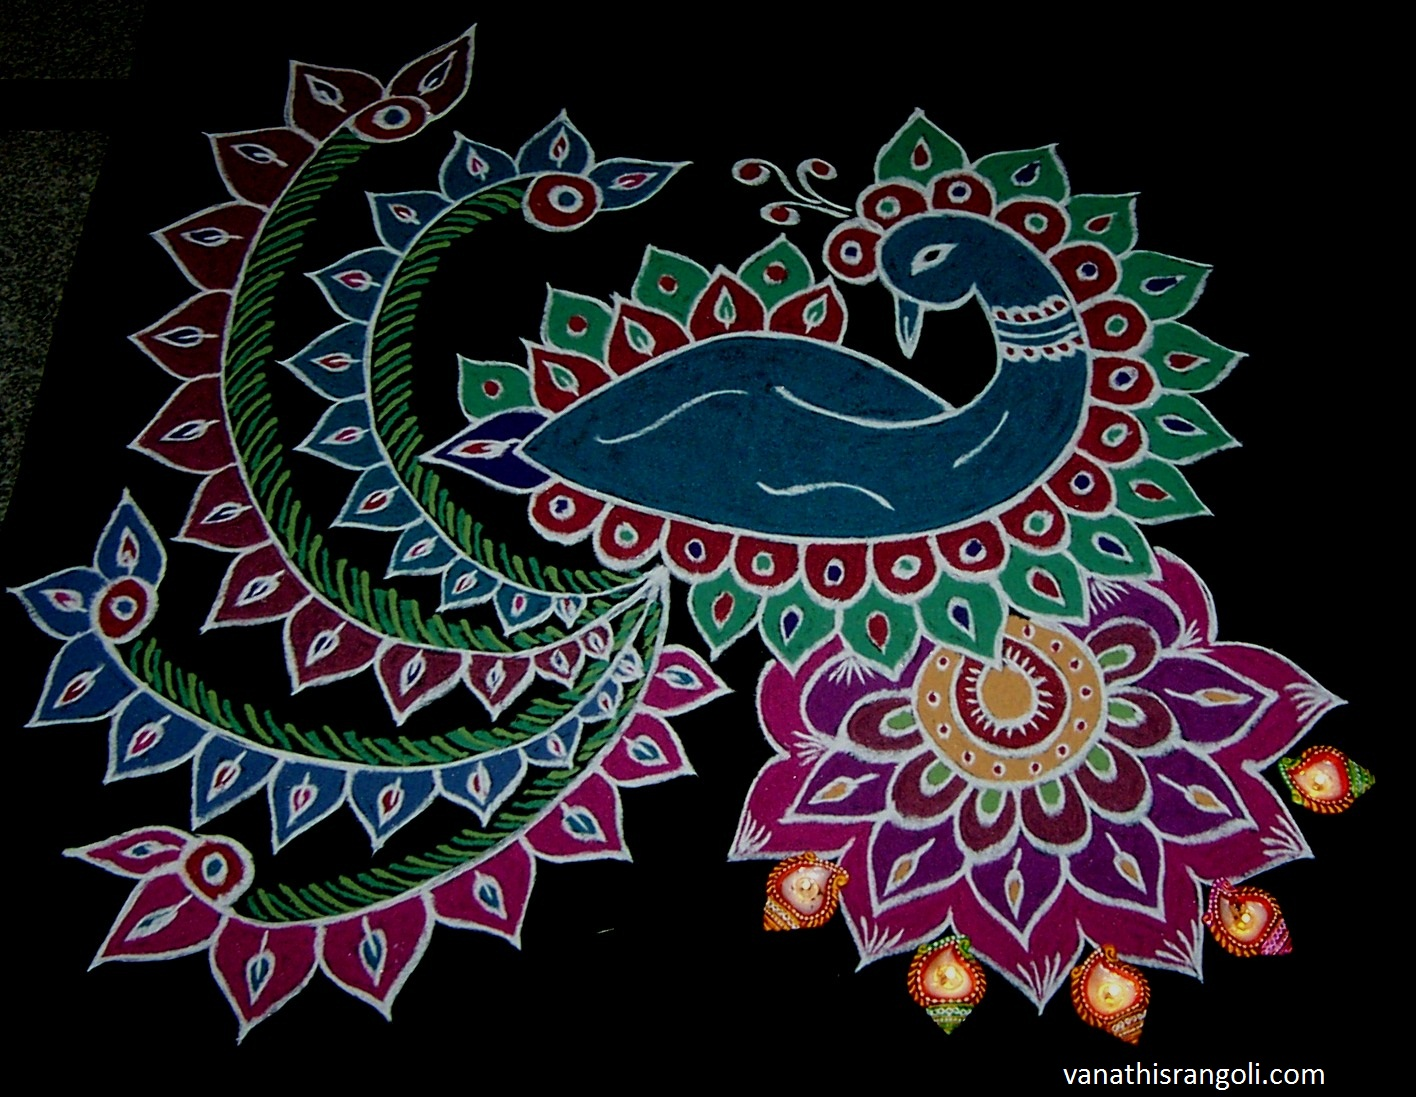 colourful flower designs drawings wwwimgkidcom the